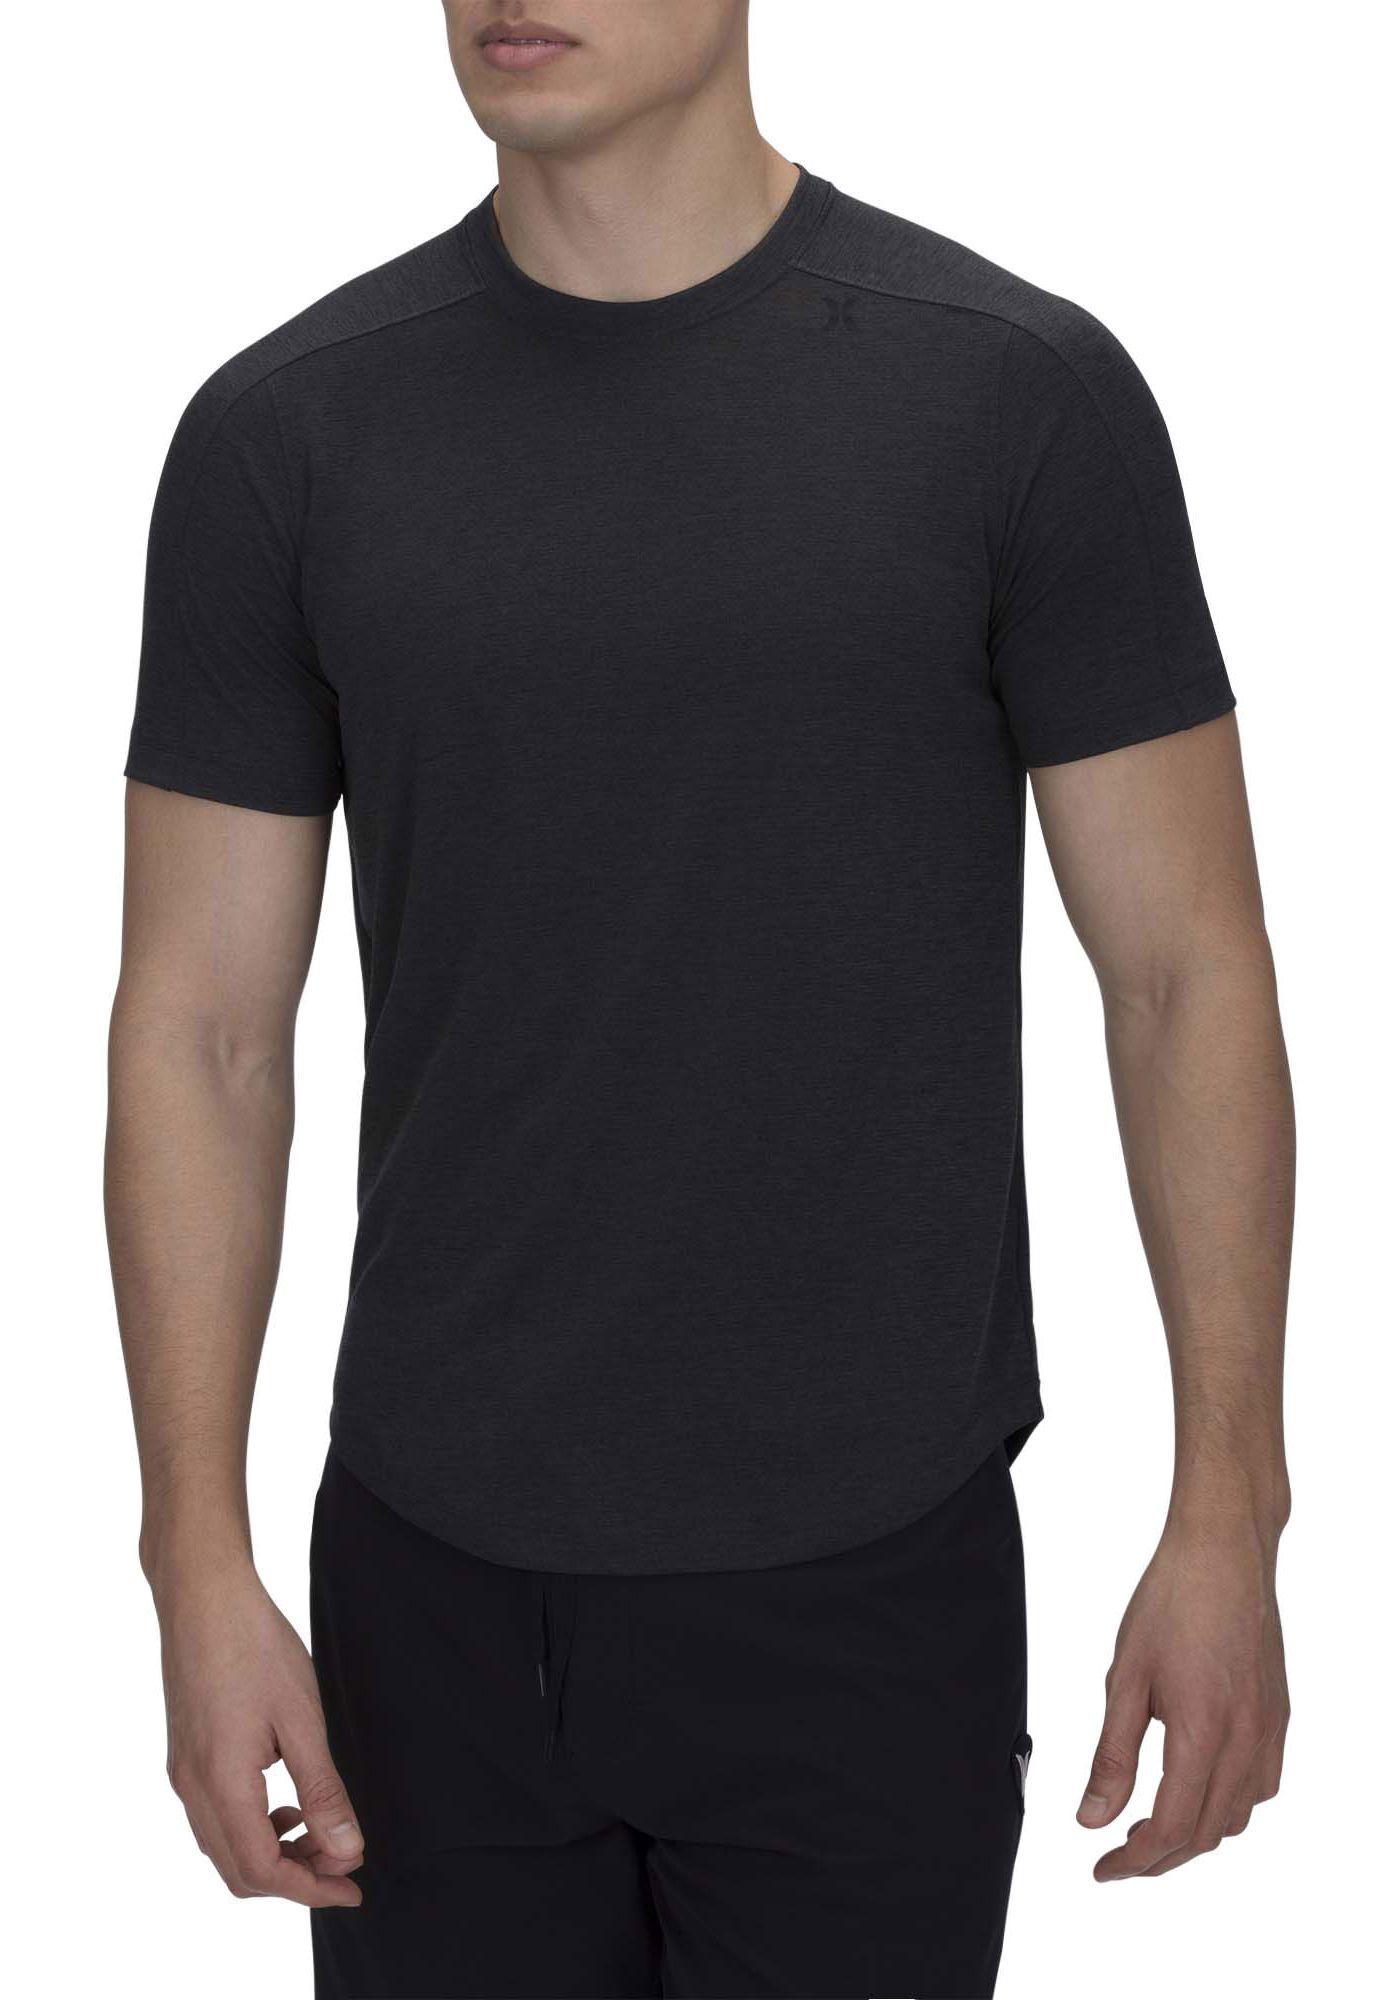 Hurley Men's Dri-FIT Breathe T-Shirt